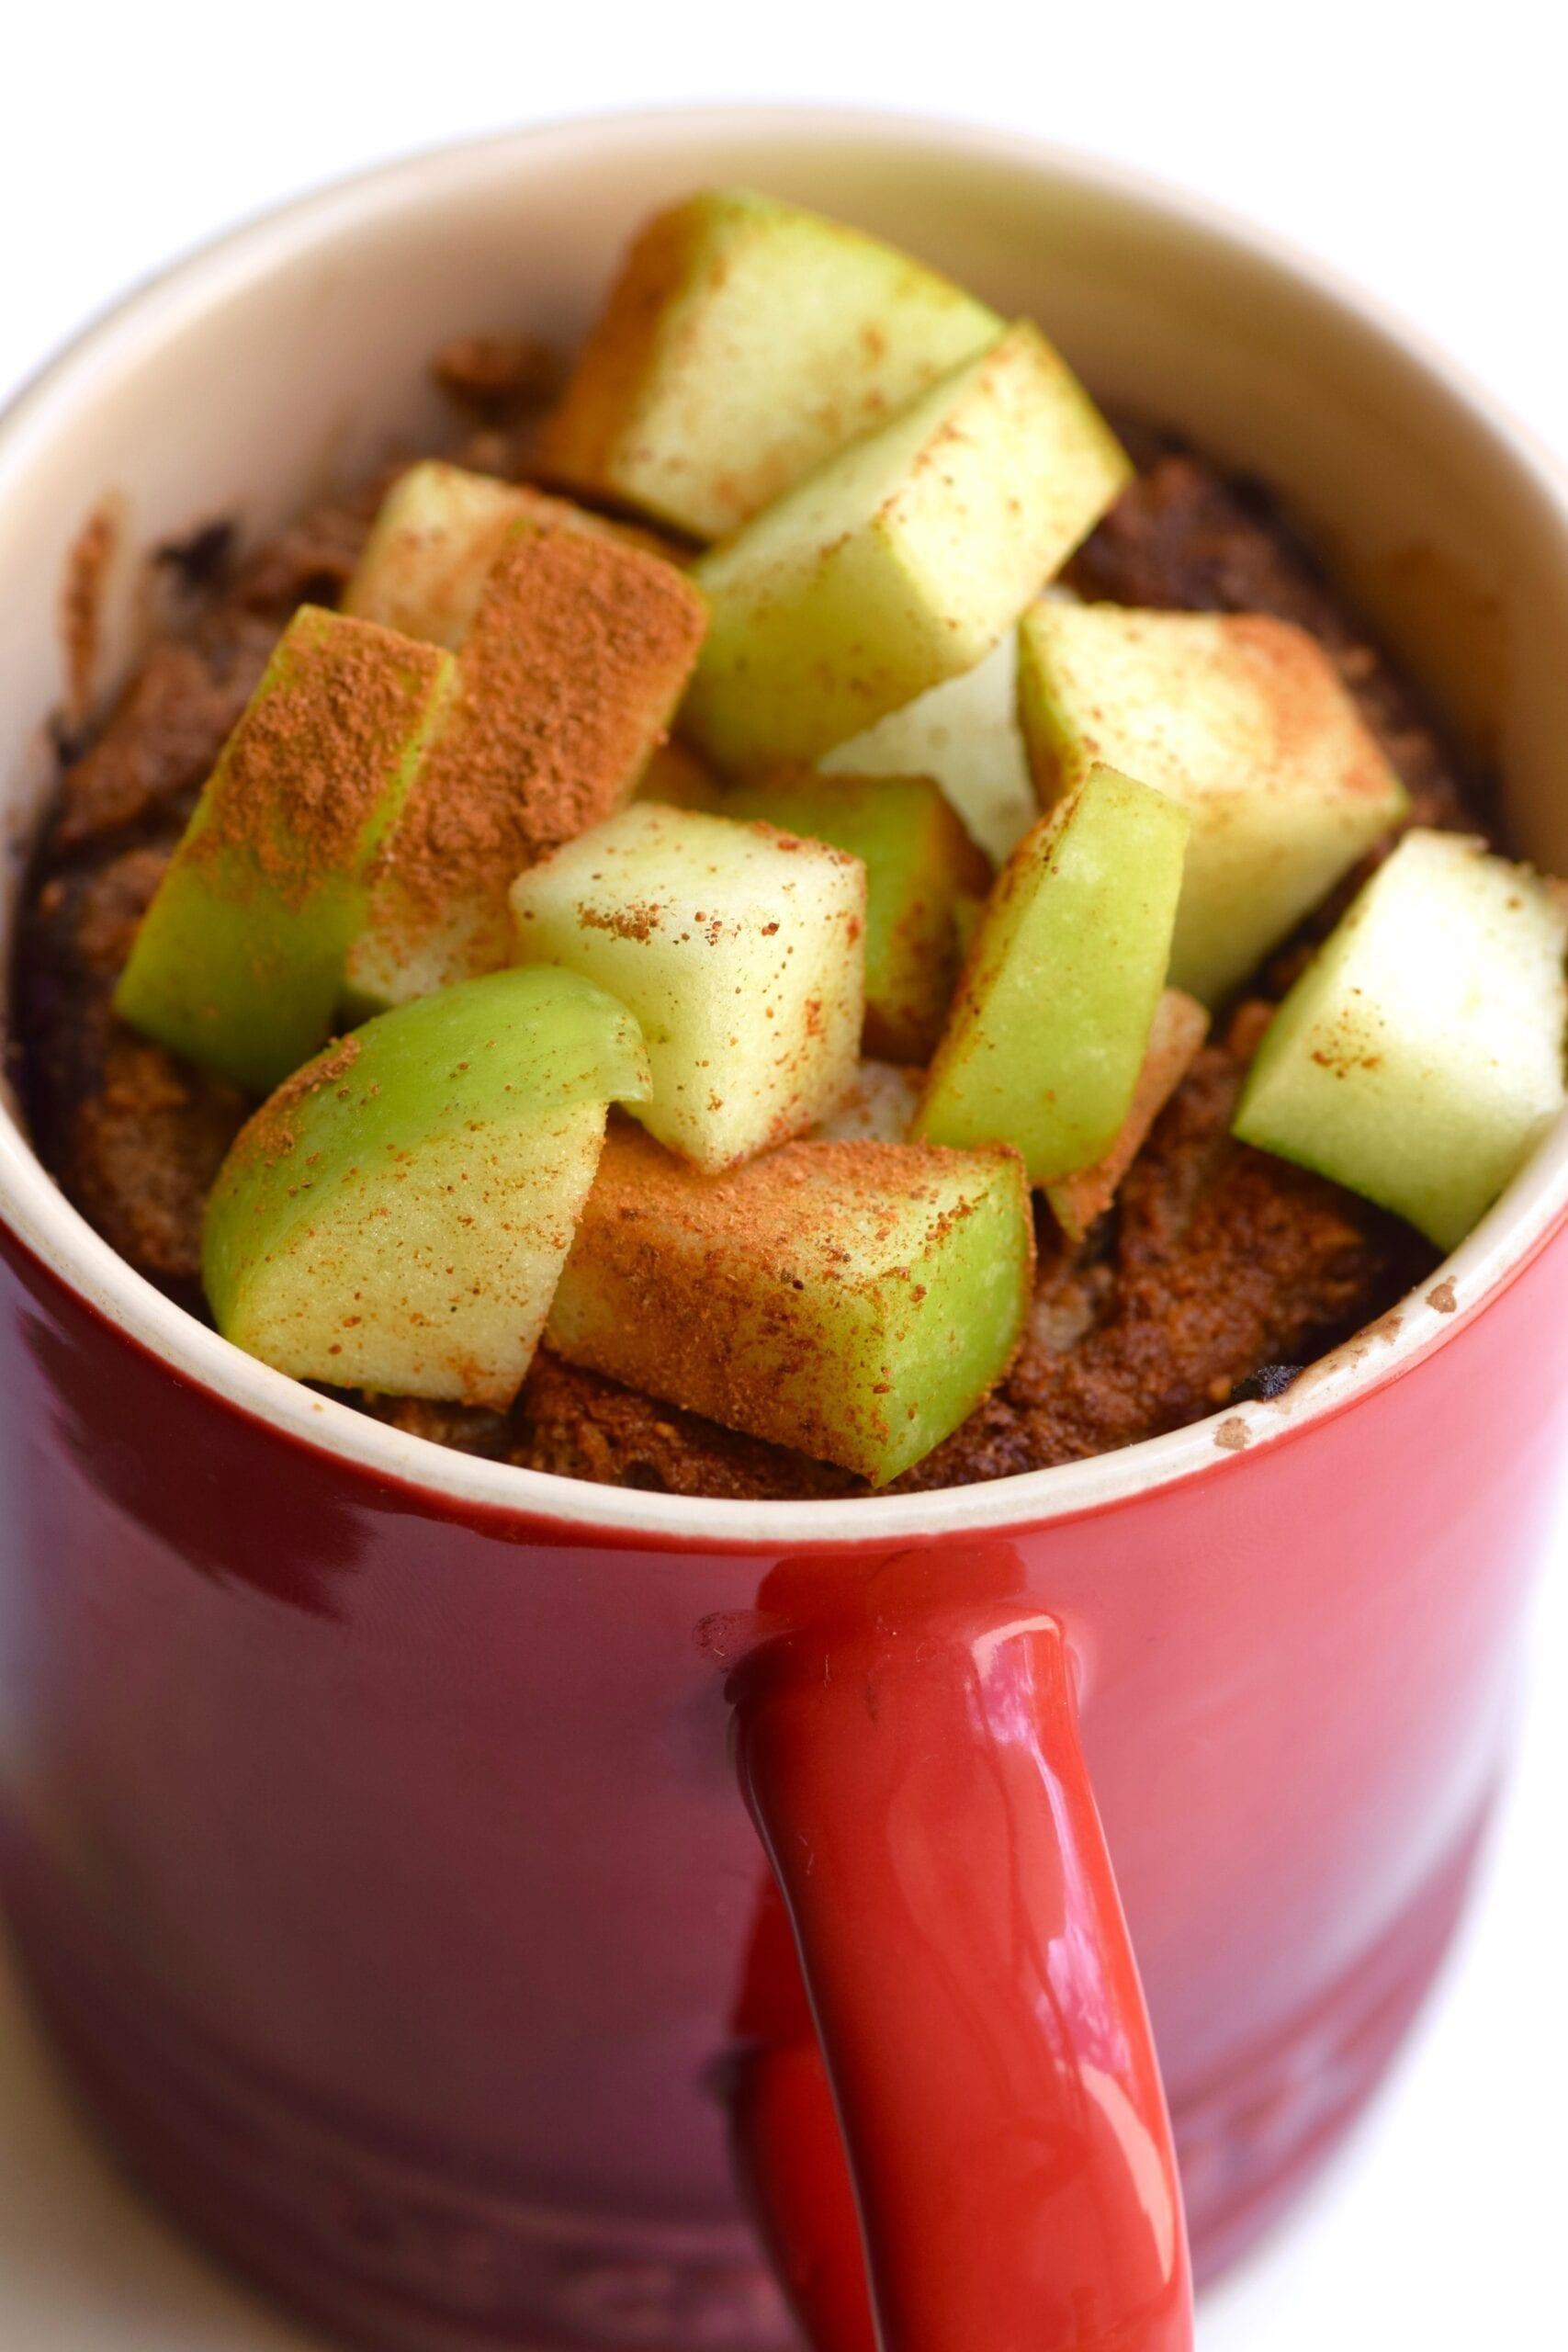 Vegan apple pie mug cake topped with extra apple cubes and cinnamon